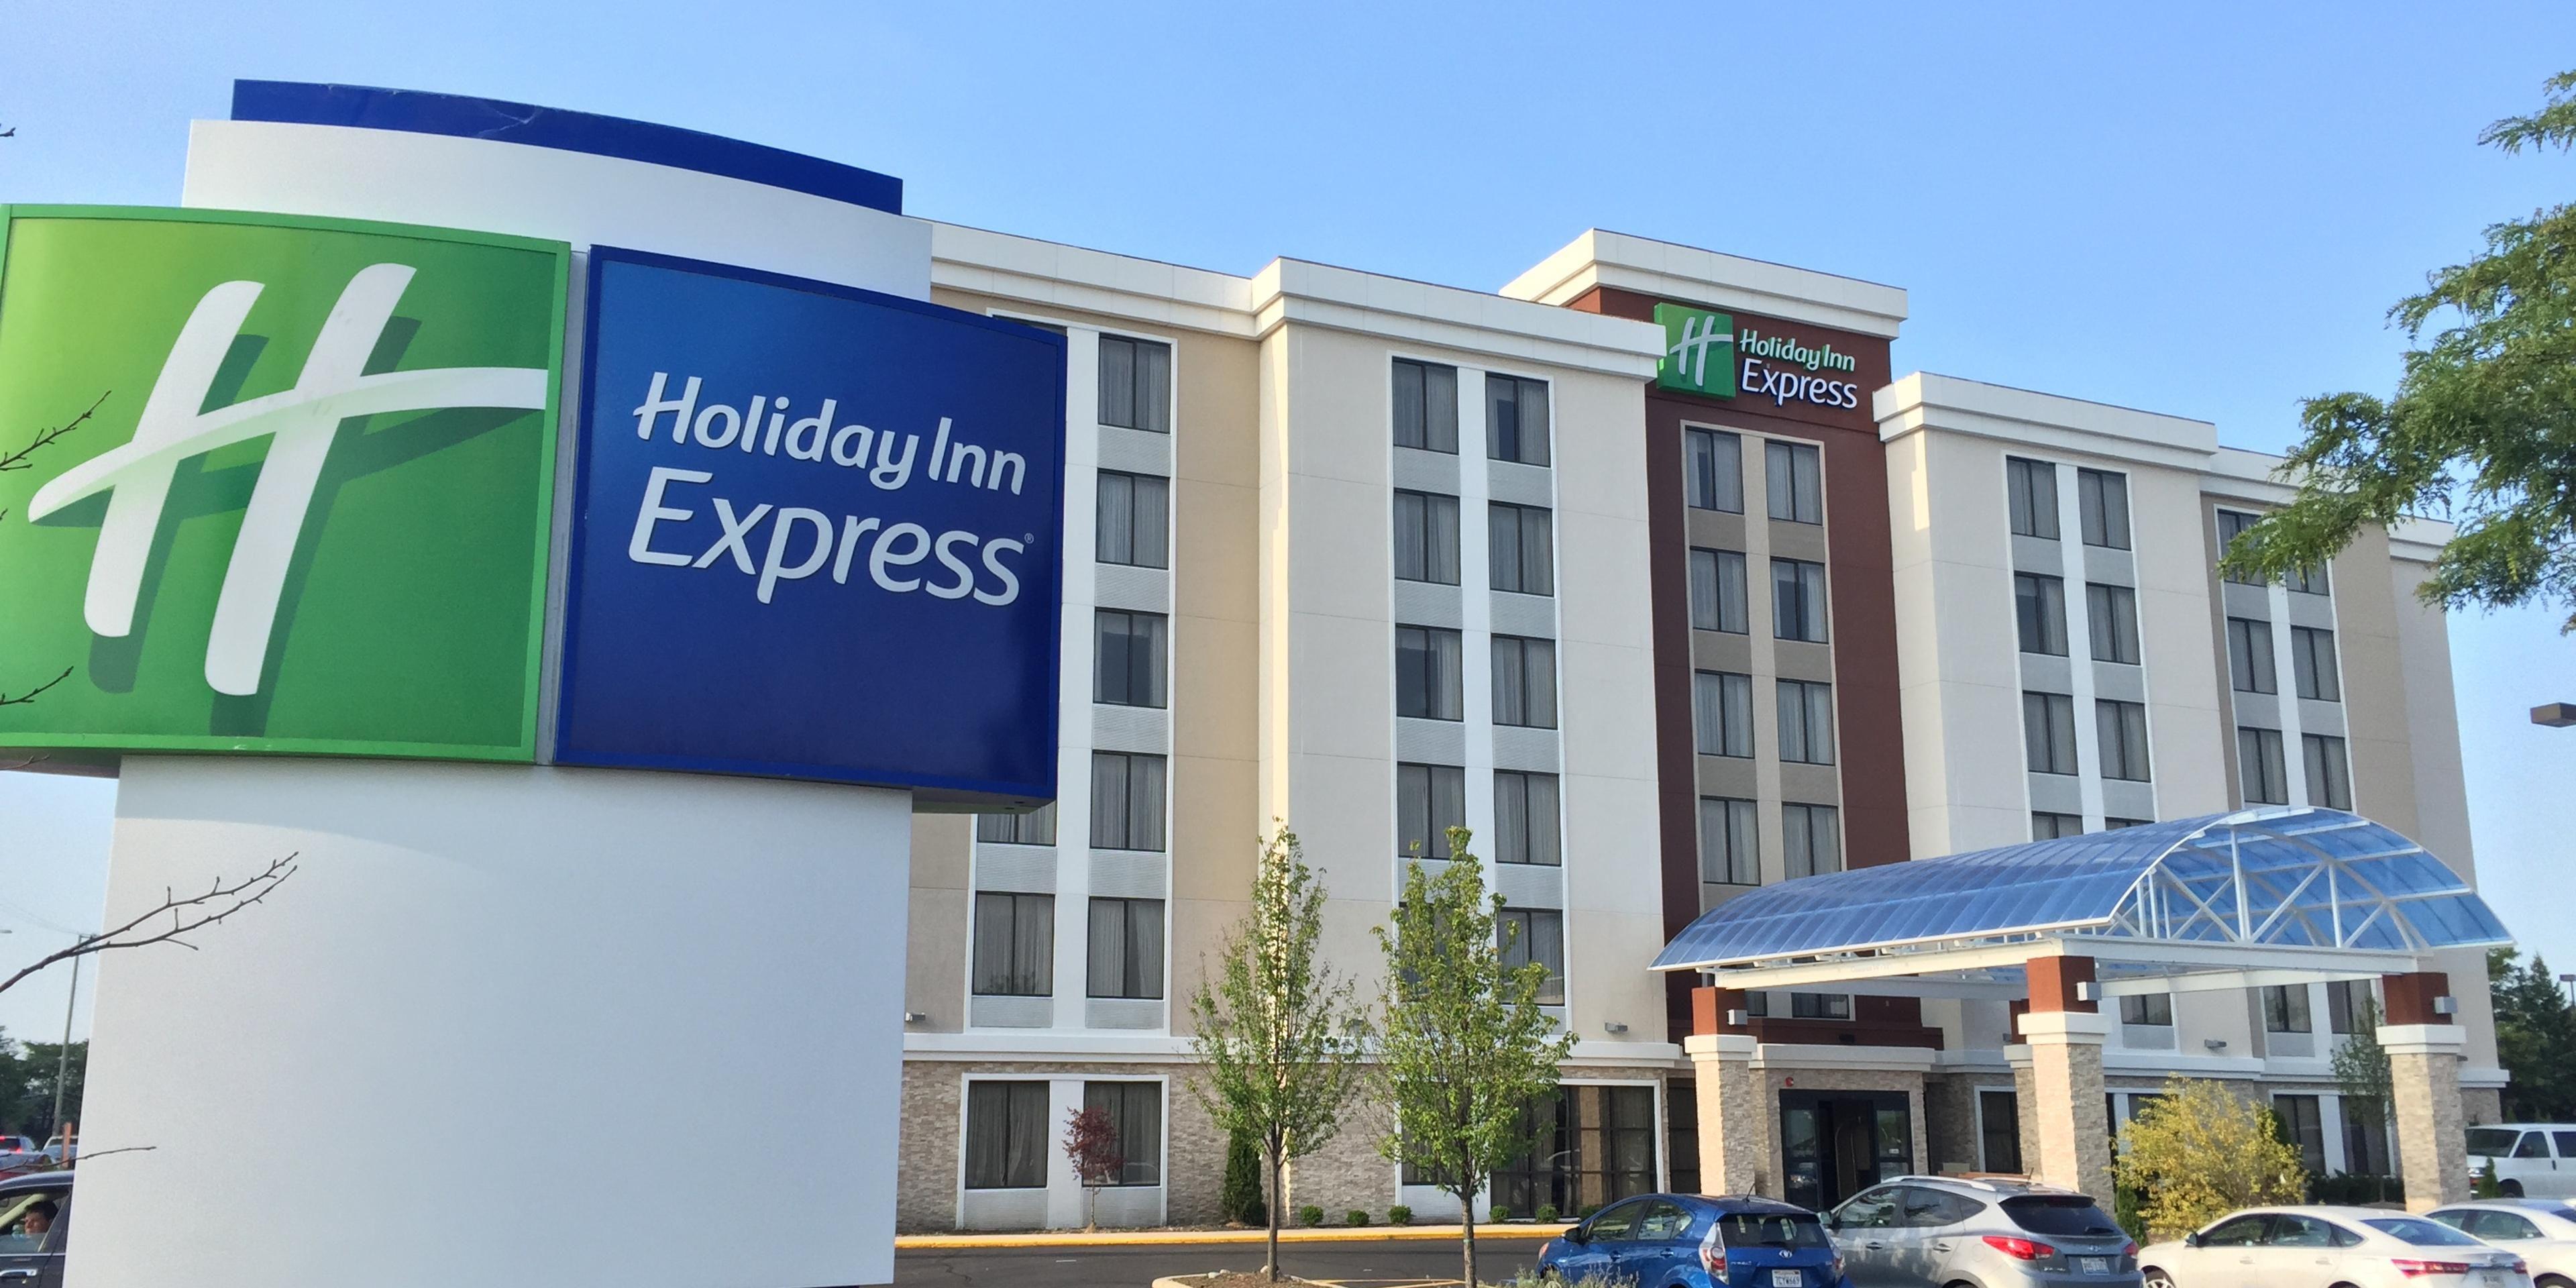 Holiday Inn Express Arlington Heights 4029588849 2x1